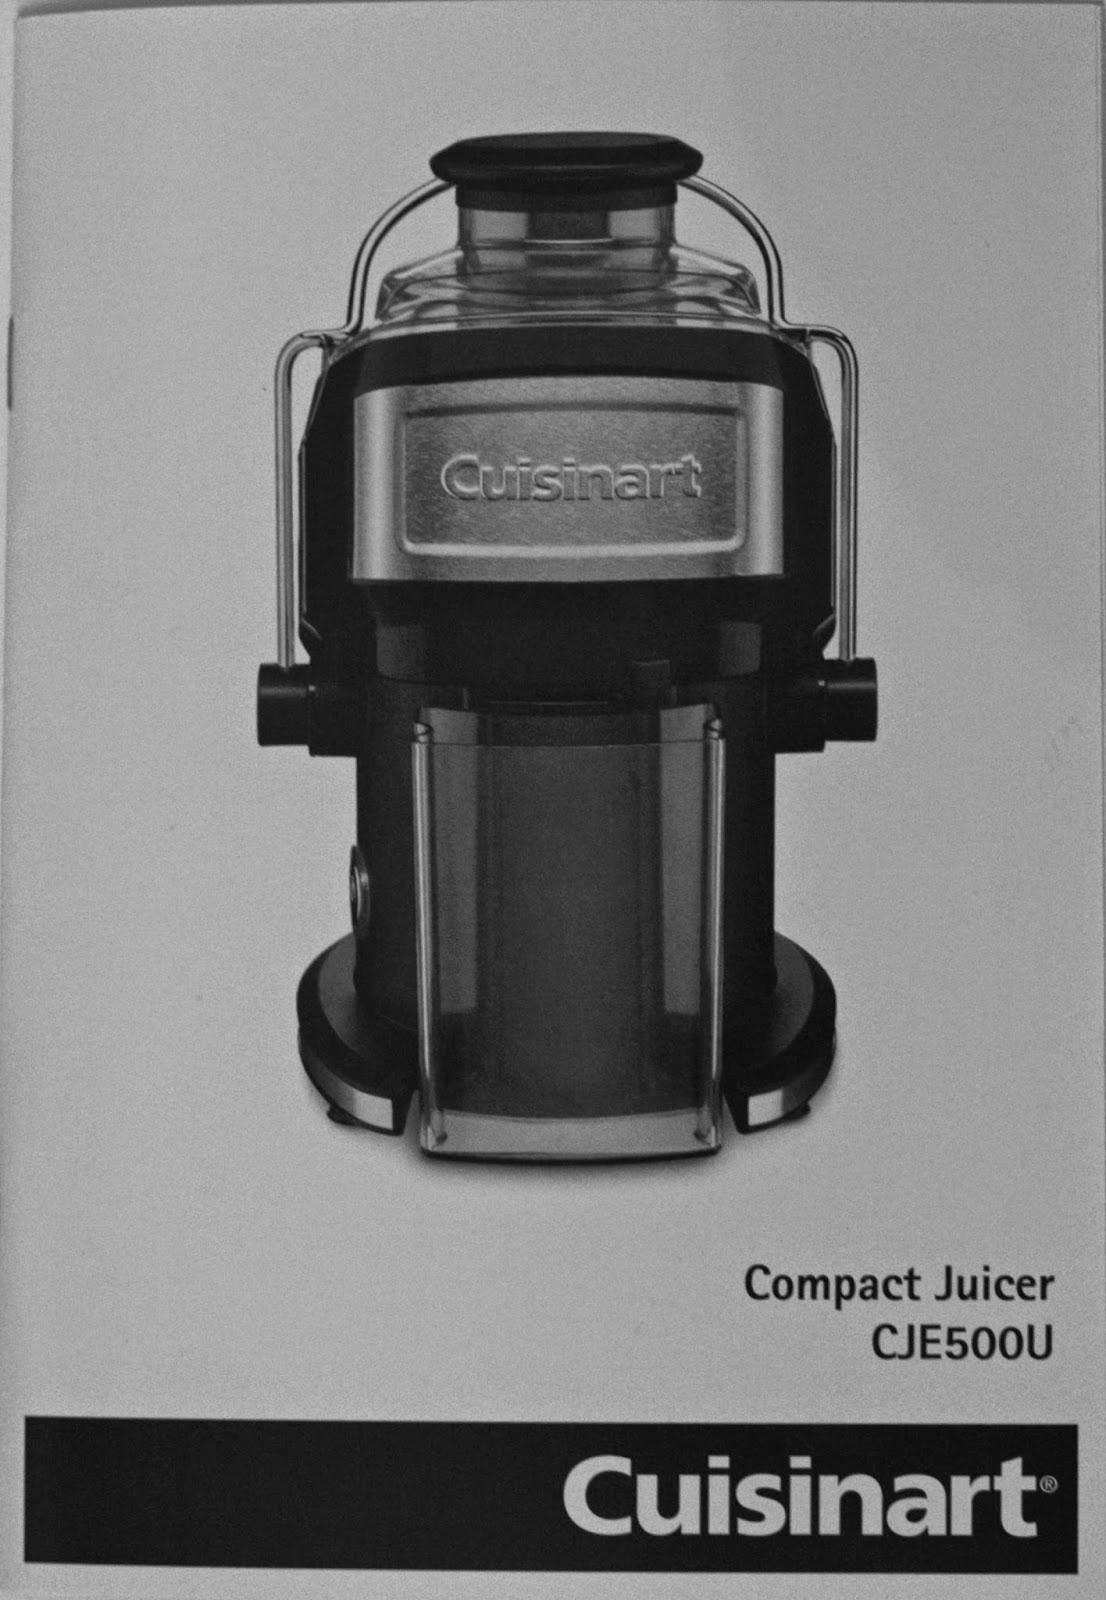 Cuisinart Compact Juicer Instructions